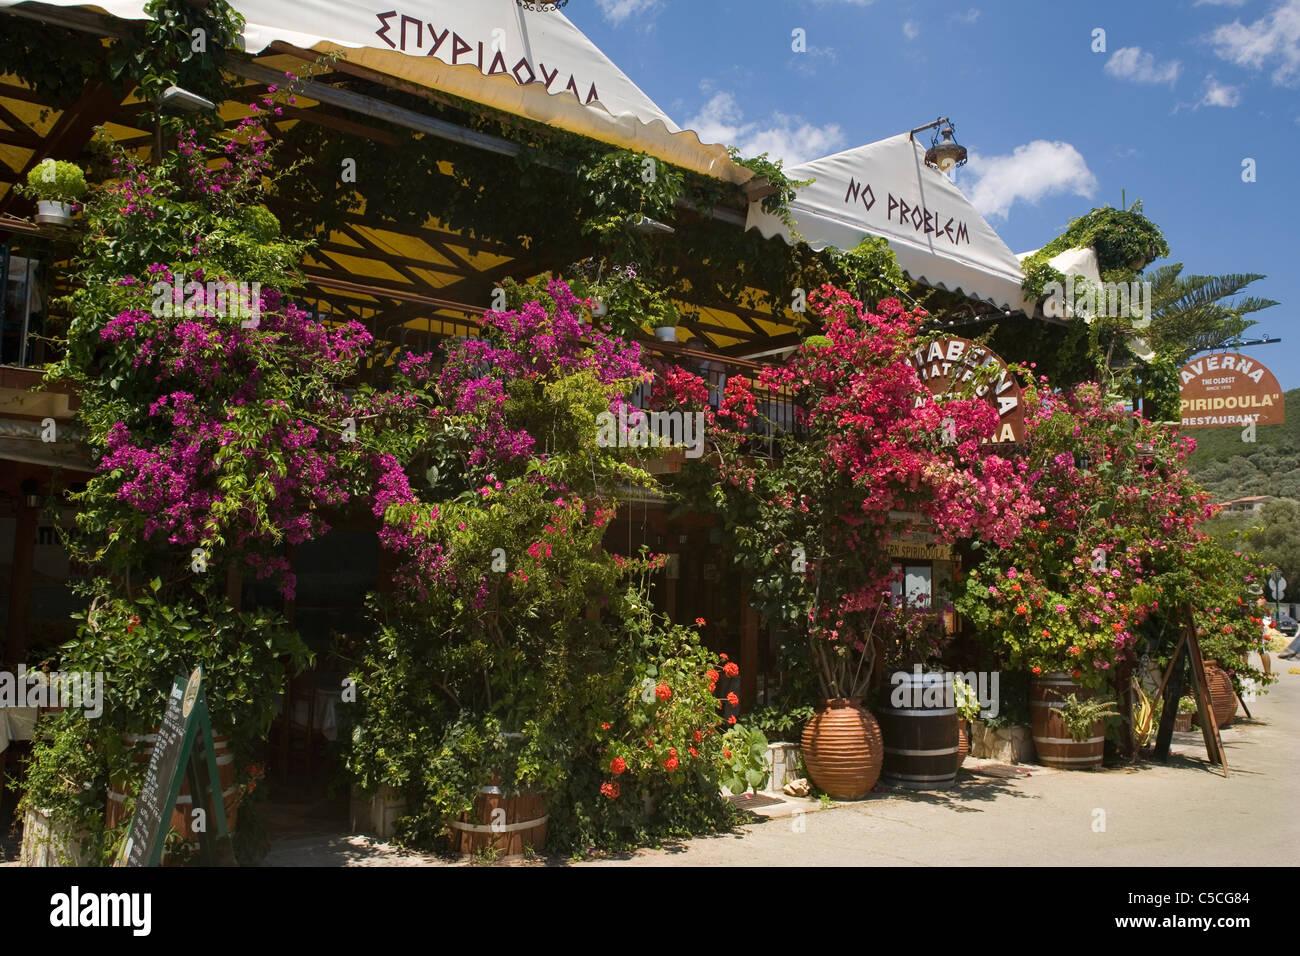 Greece Ionian islands Lefkada Sivota taverna - Stock Image